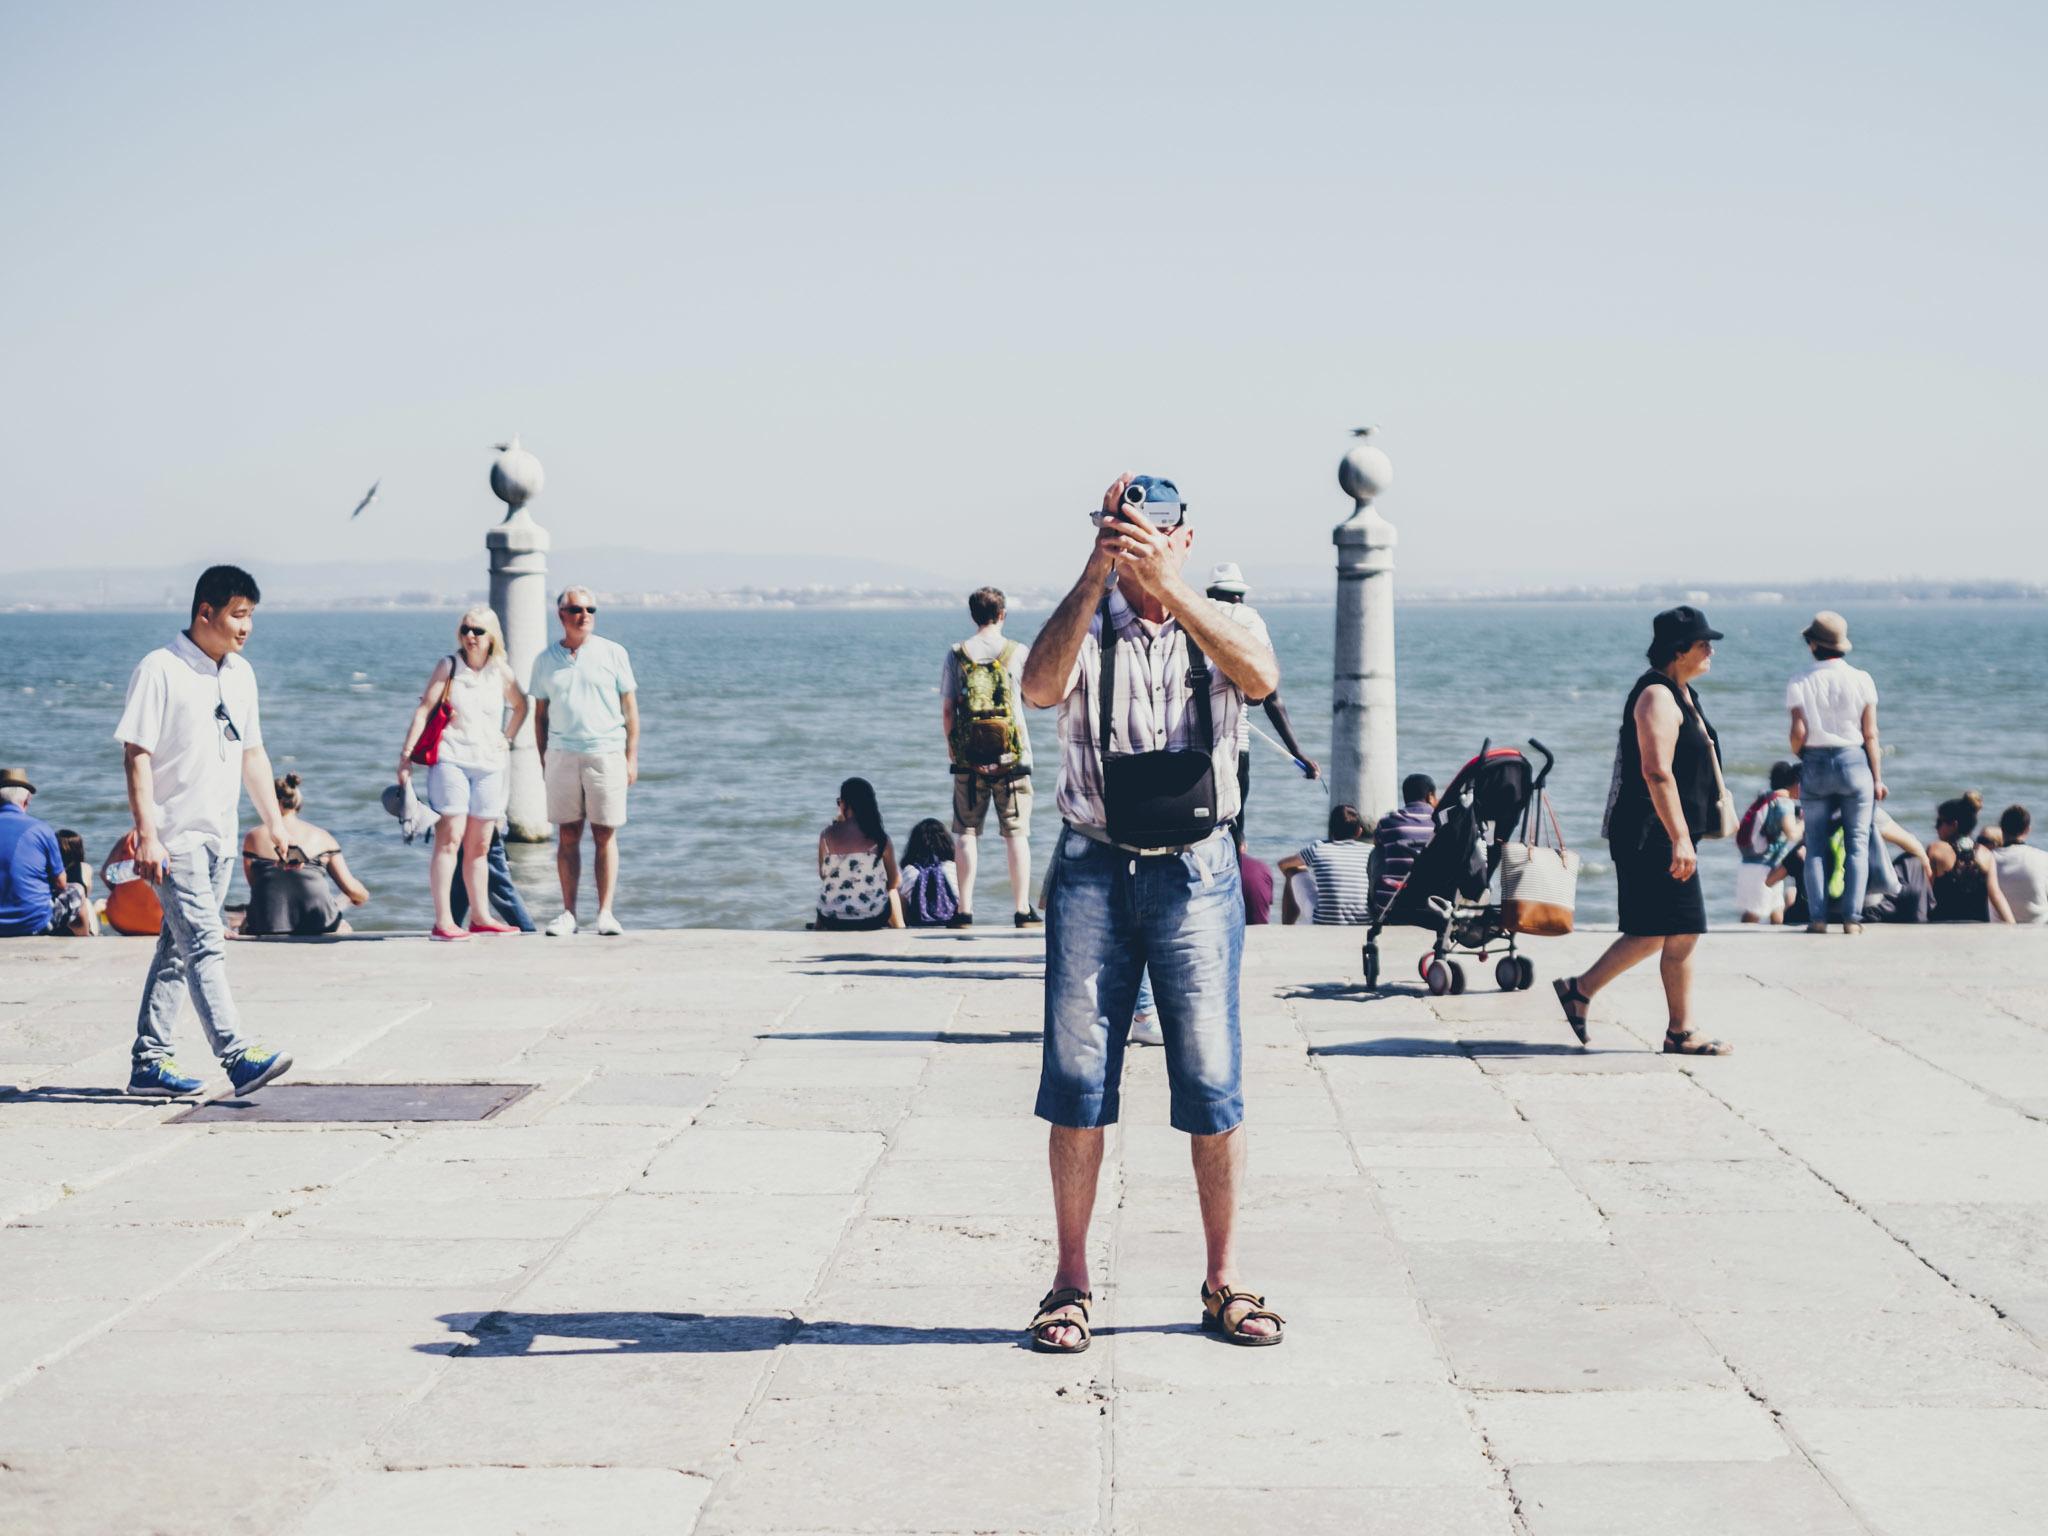 Lisbon Travel Guide: 10 tips for surviving in Lisbon